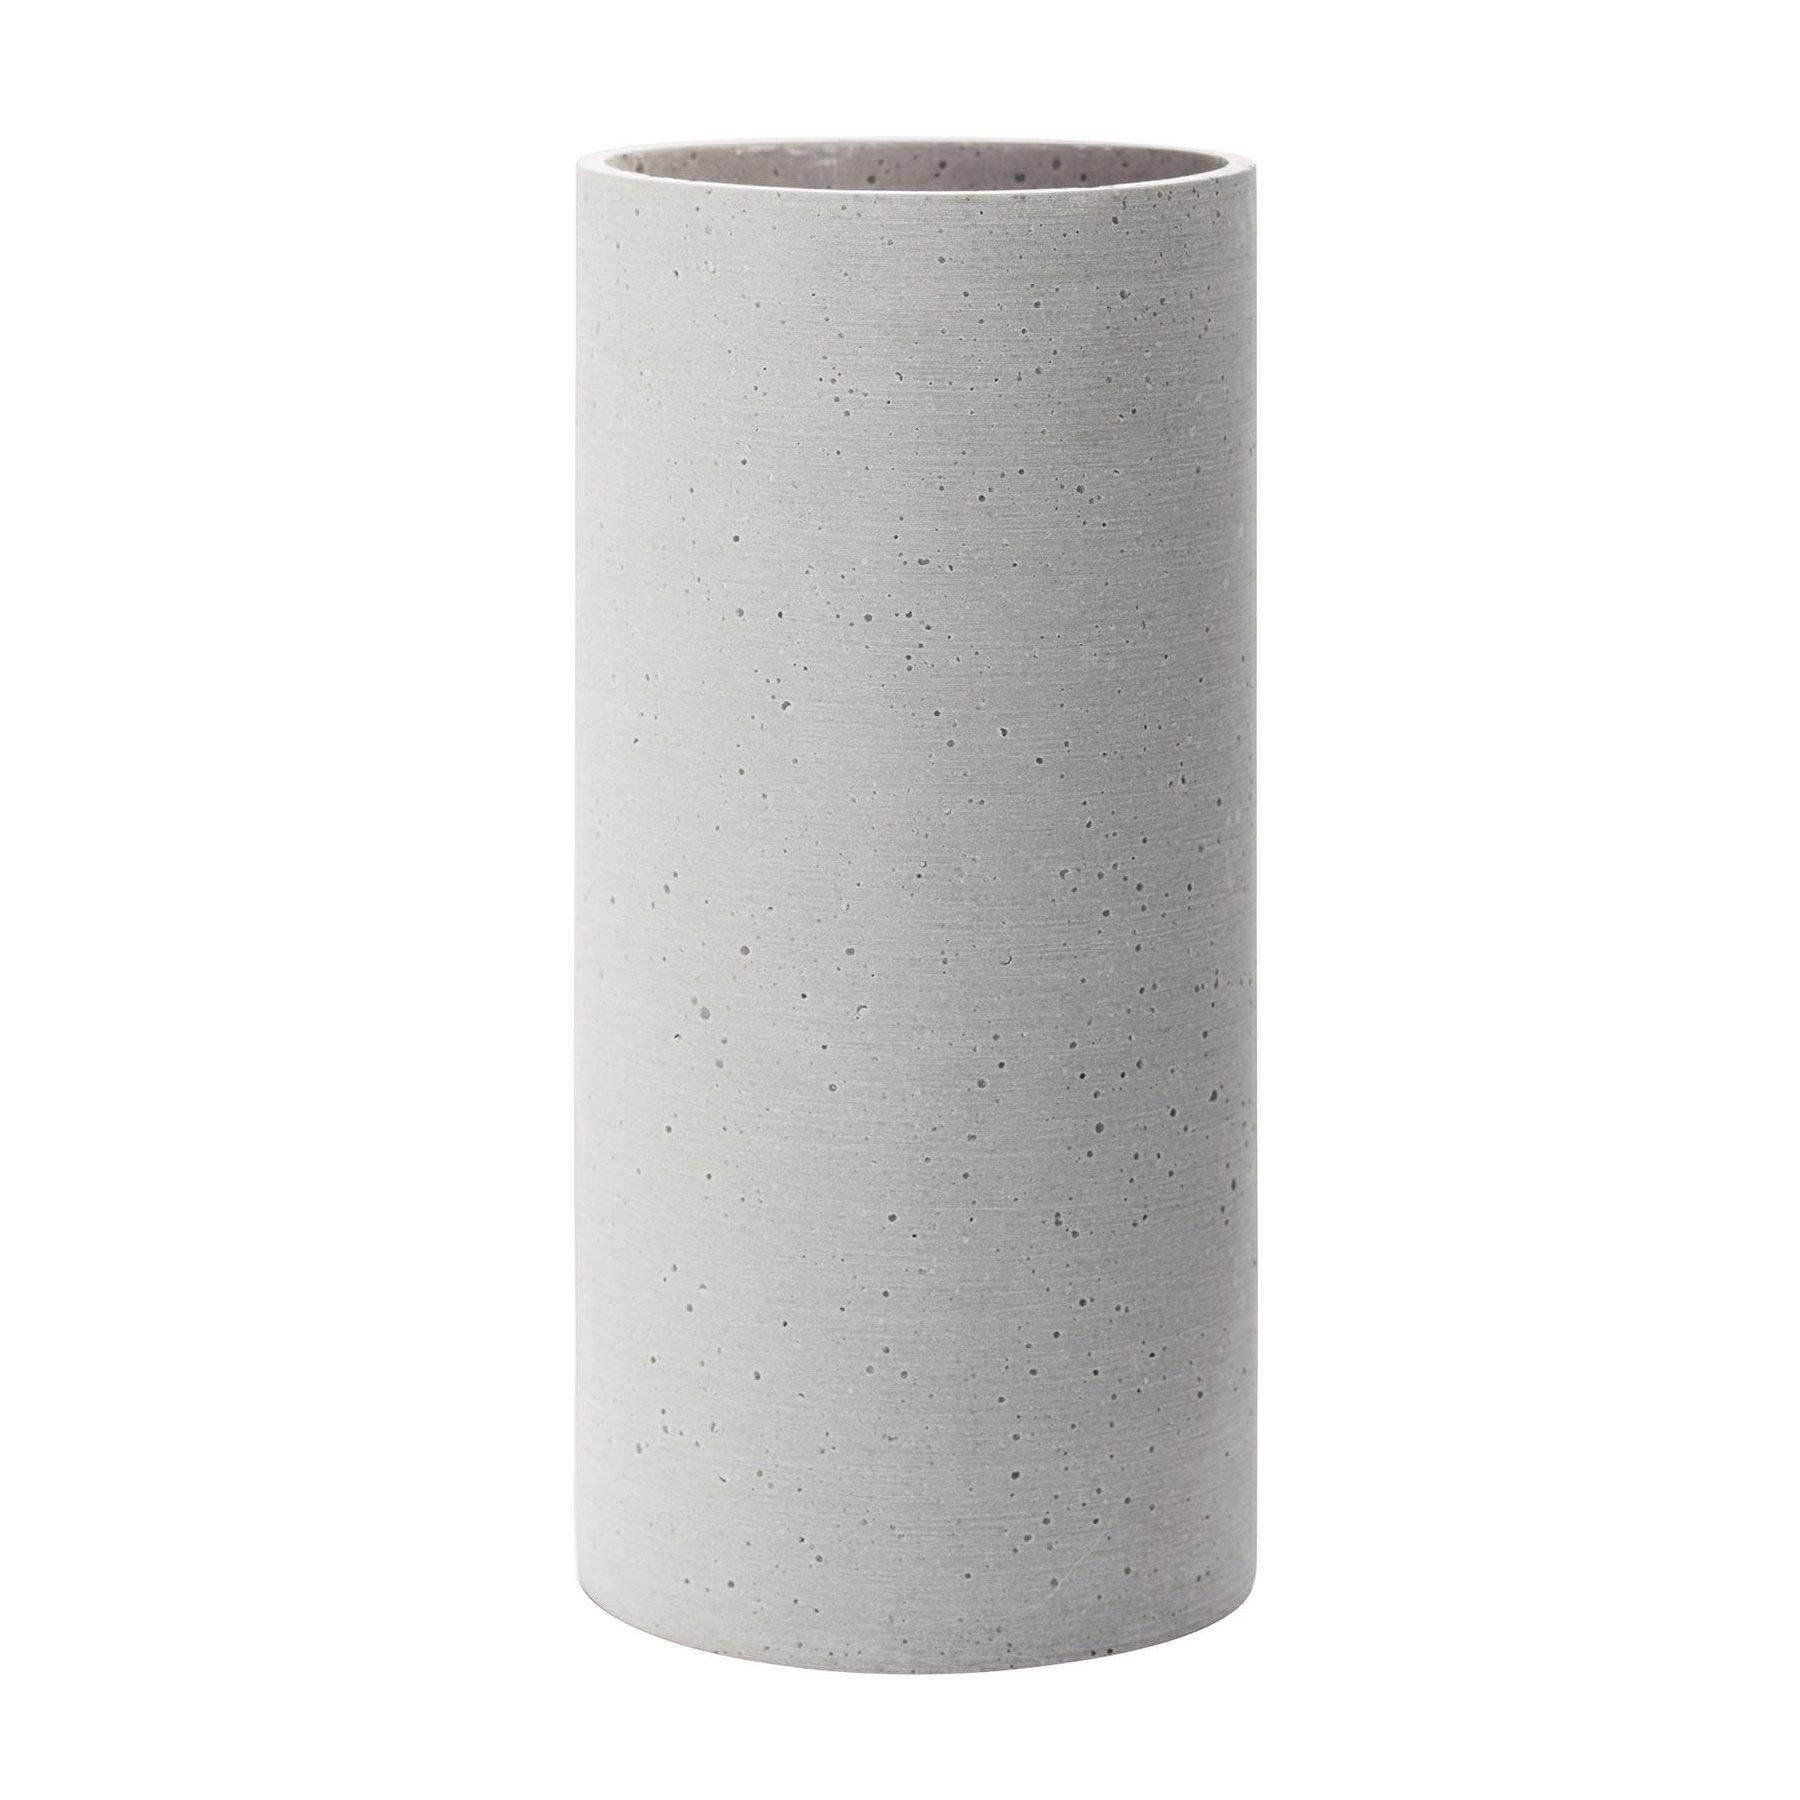 Blomus 65597 Coluna Vase-Large, Light Gray